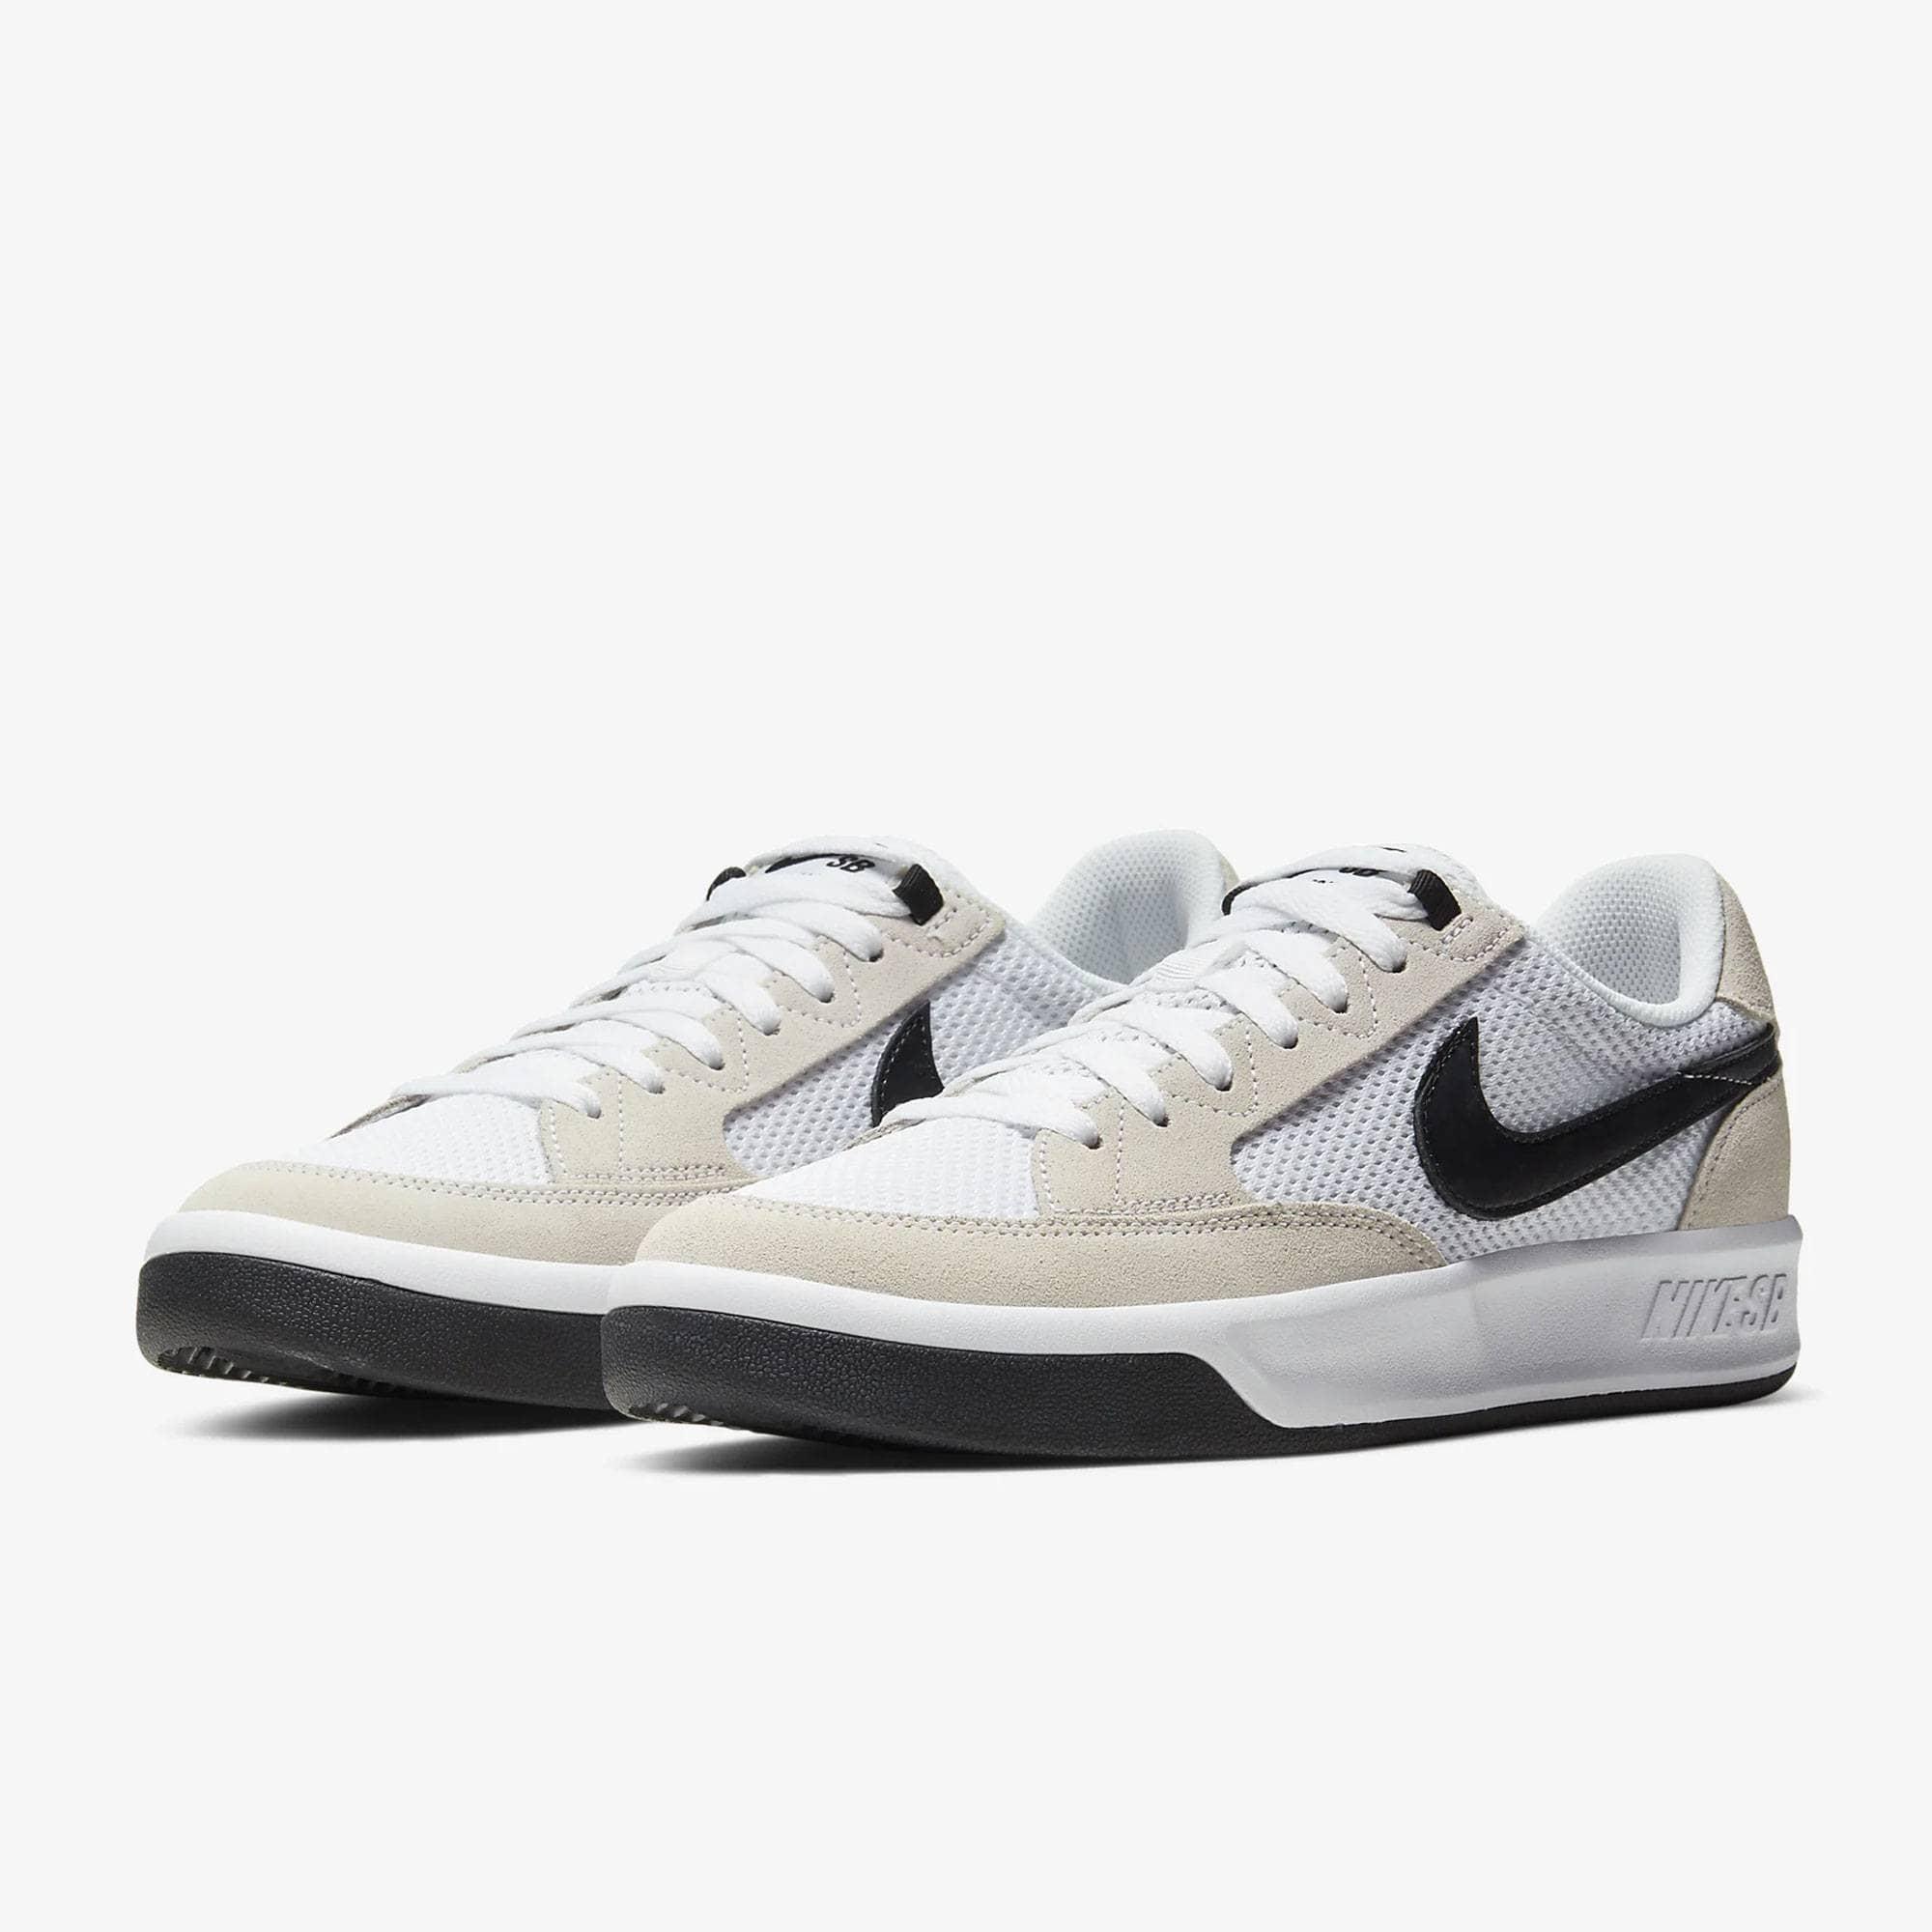 Nike SB Adversary Skate Shoes - White/Black-White